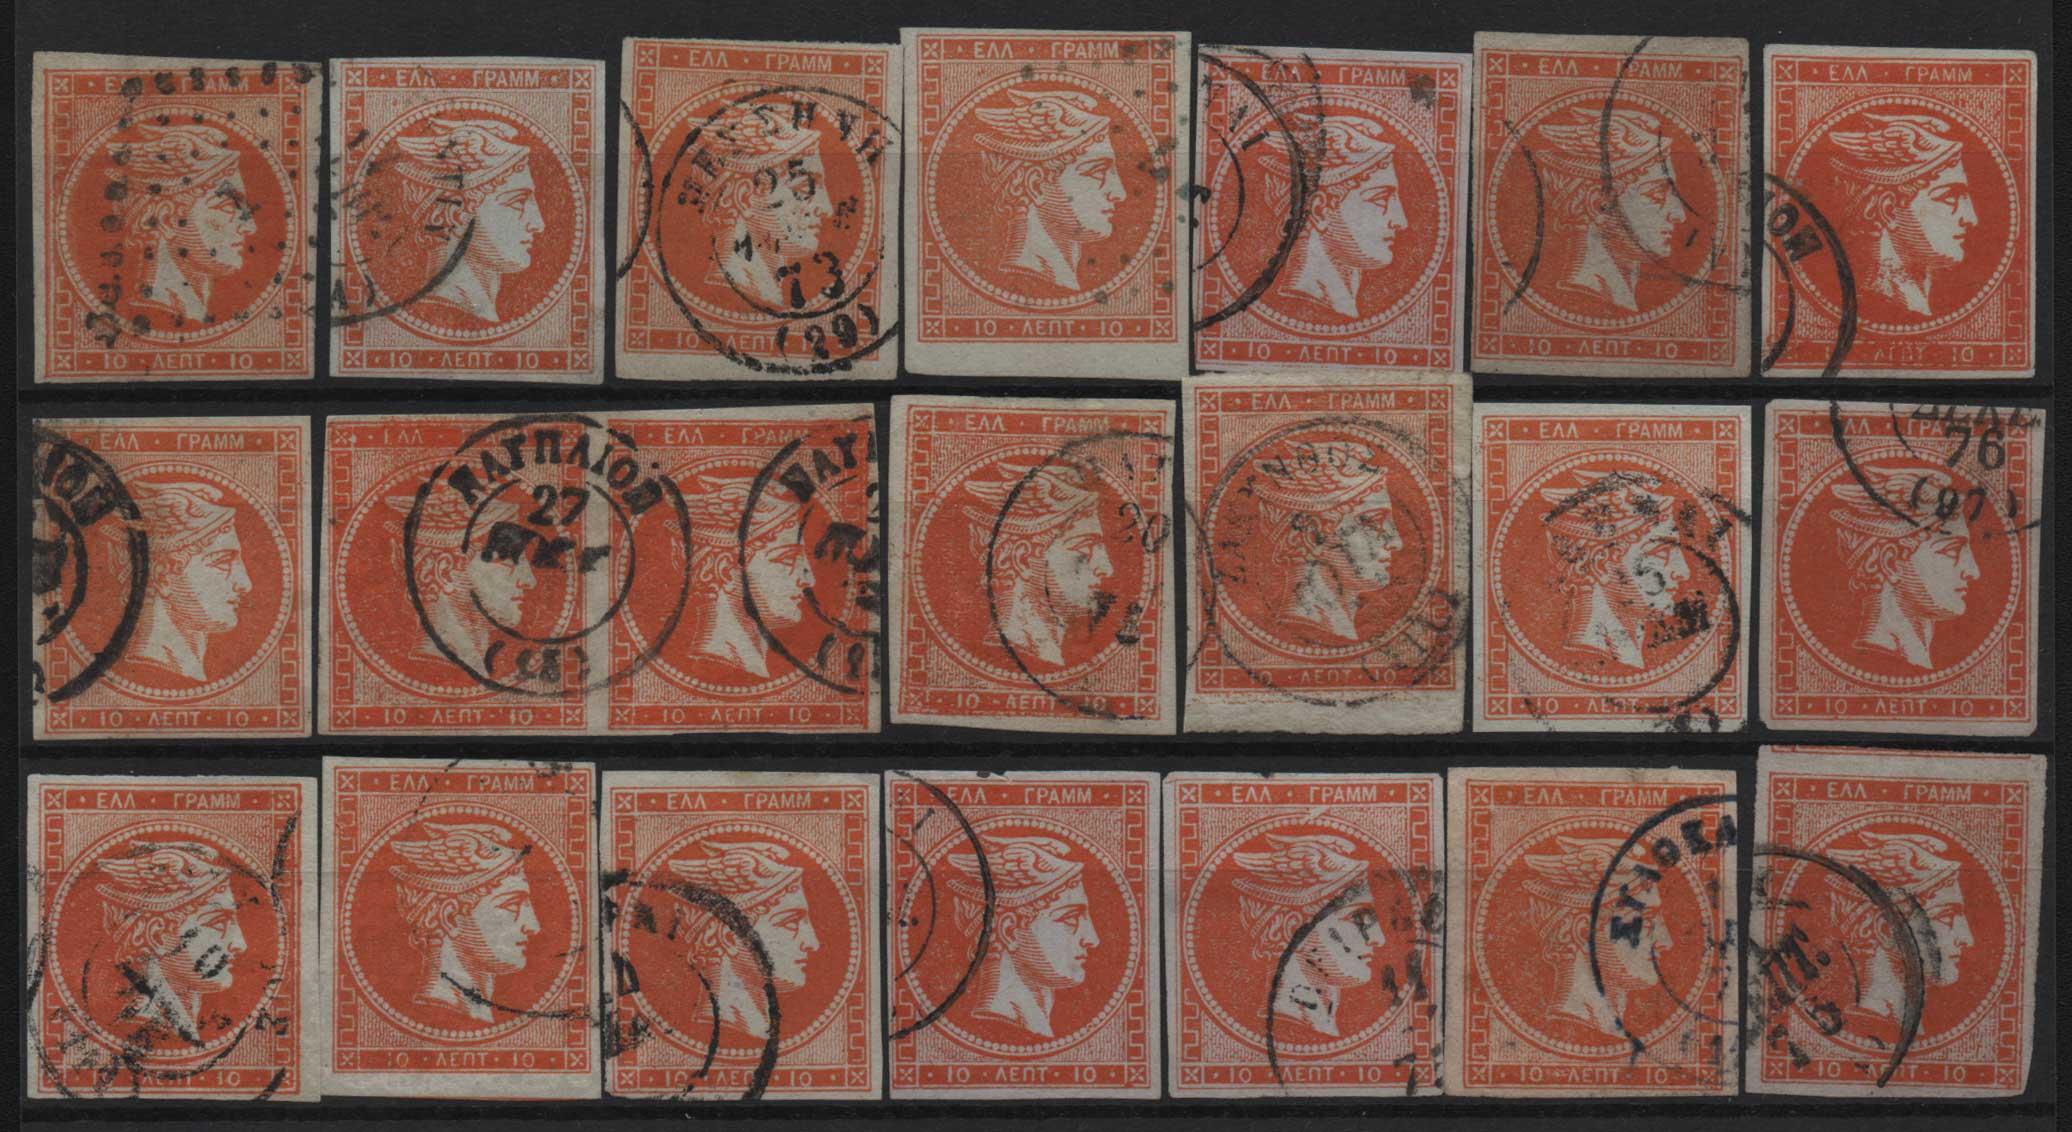 Lot 35 - -  LARGE HERMES HEAD large hermes head -  Athens Auctions Public Auction 76 General Stamp Sale